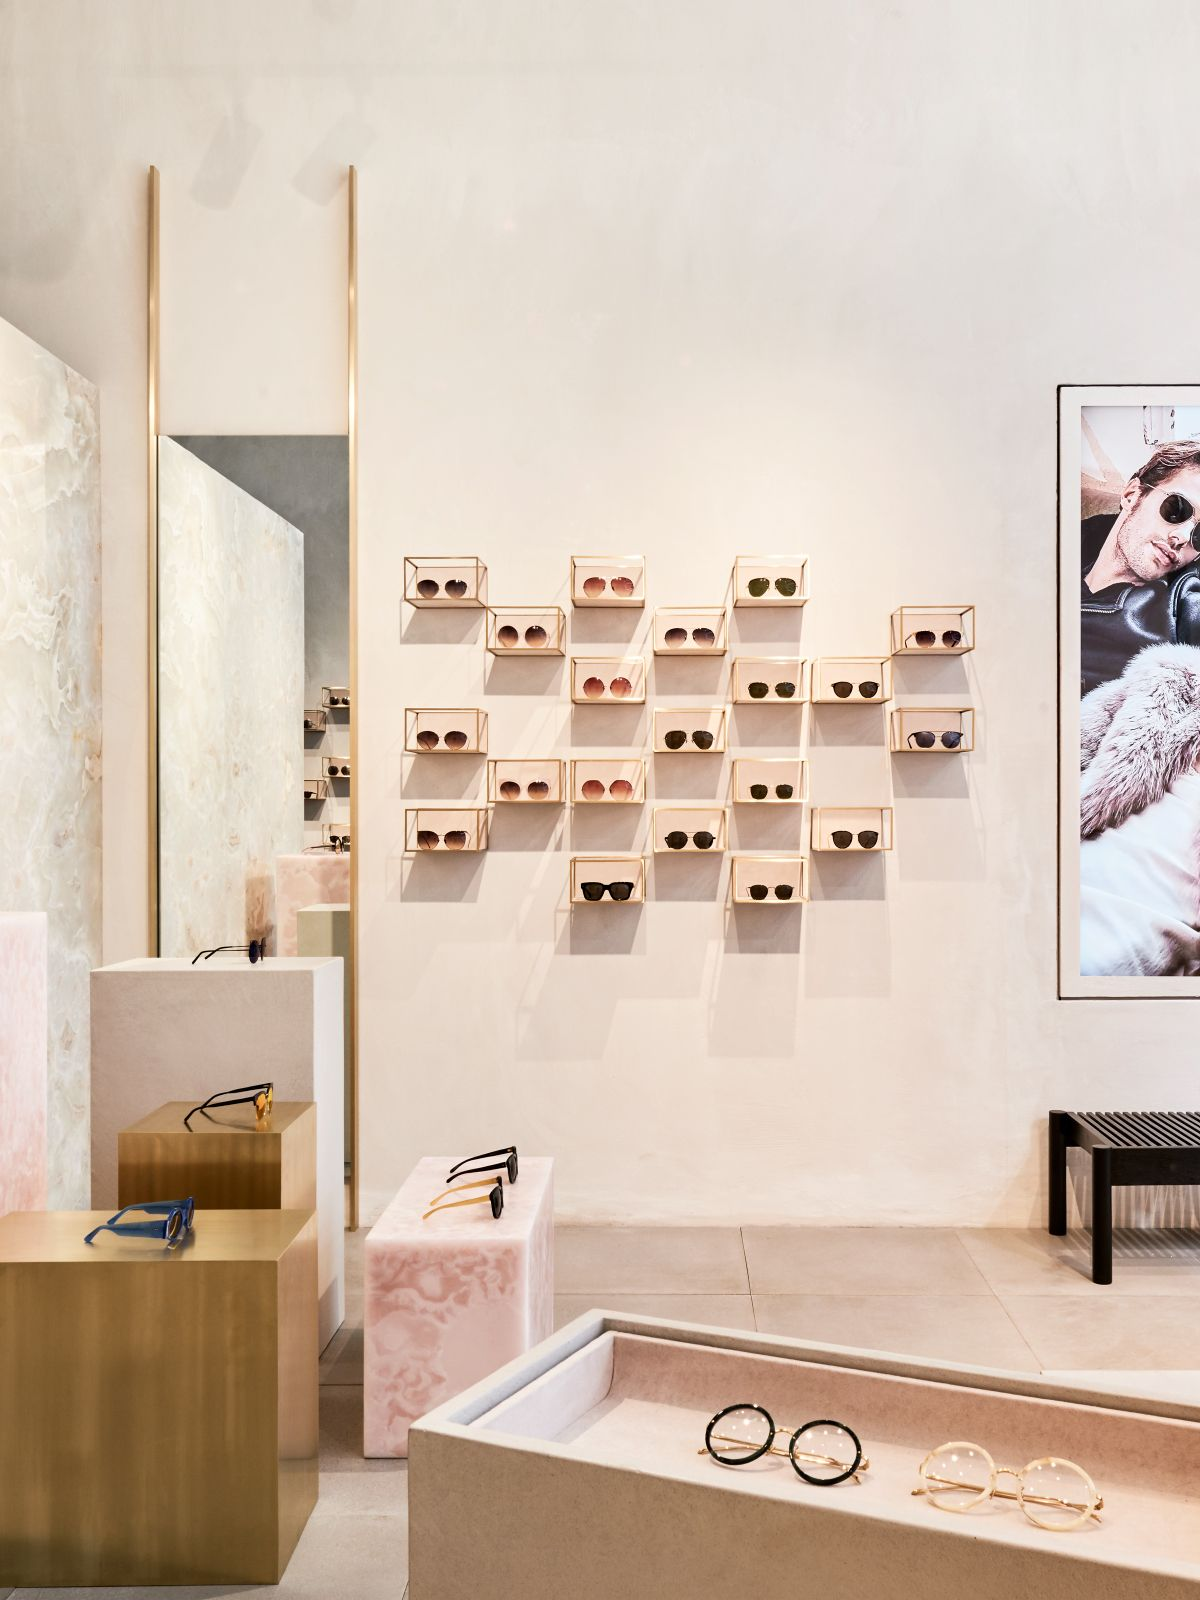 b4faad3789e9 Linda Farrow New York Store  109 Greene Street New York